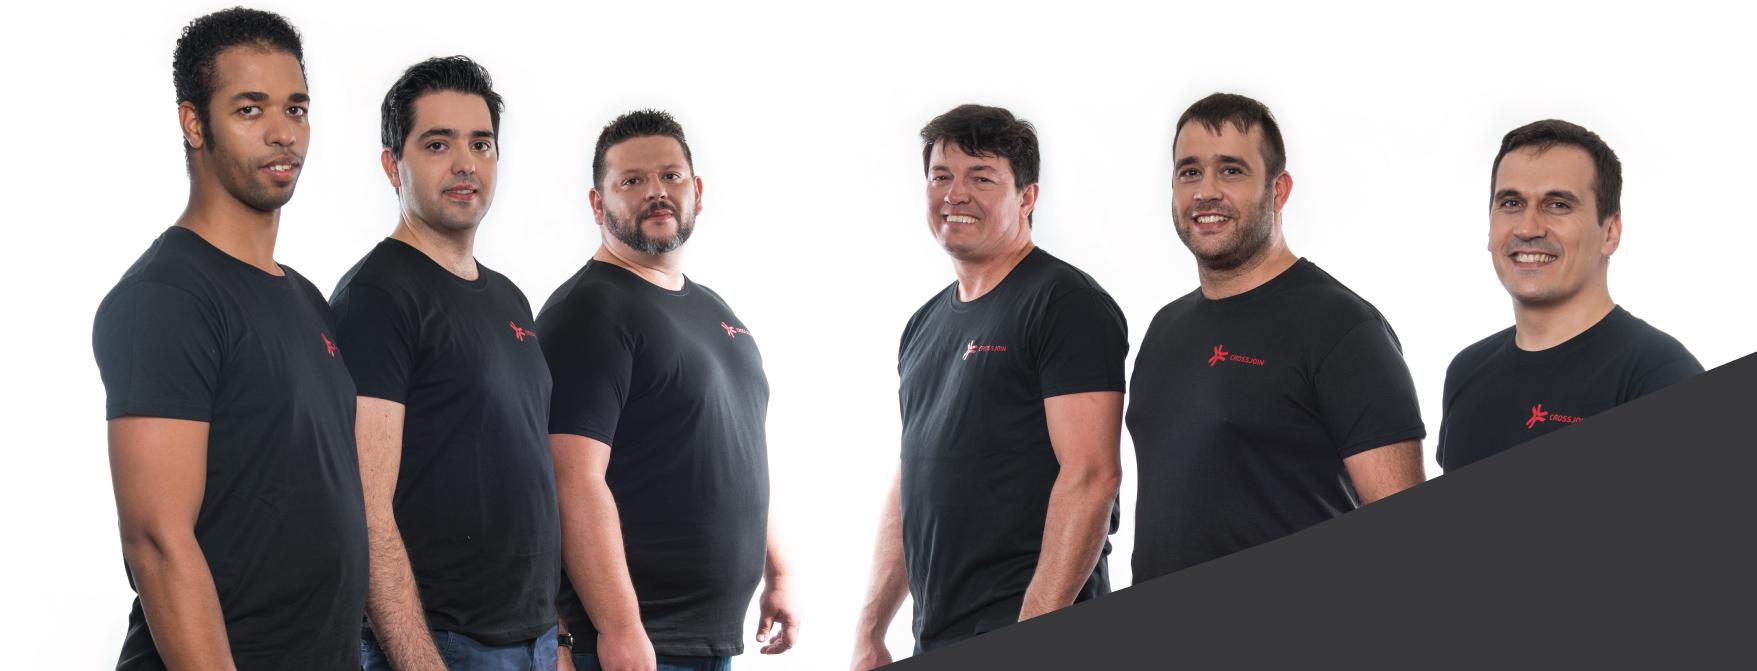 equipa_mobile